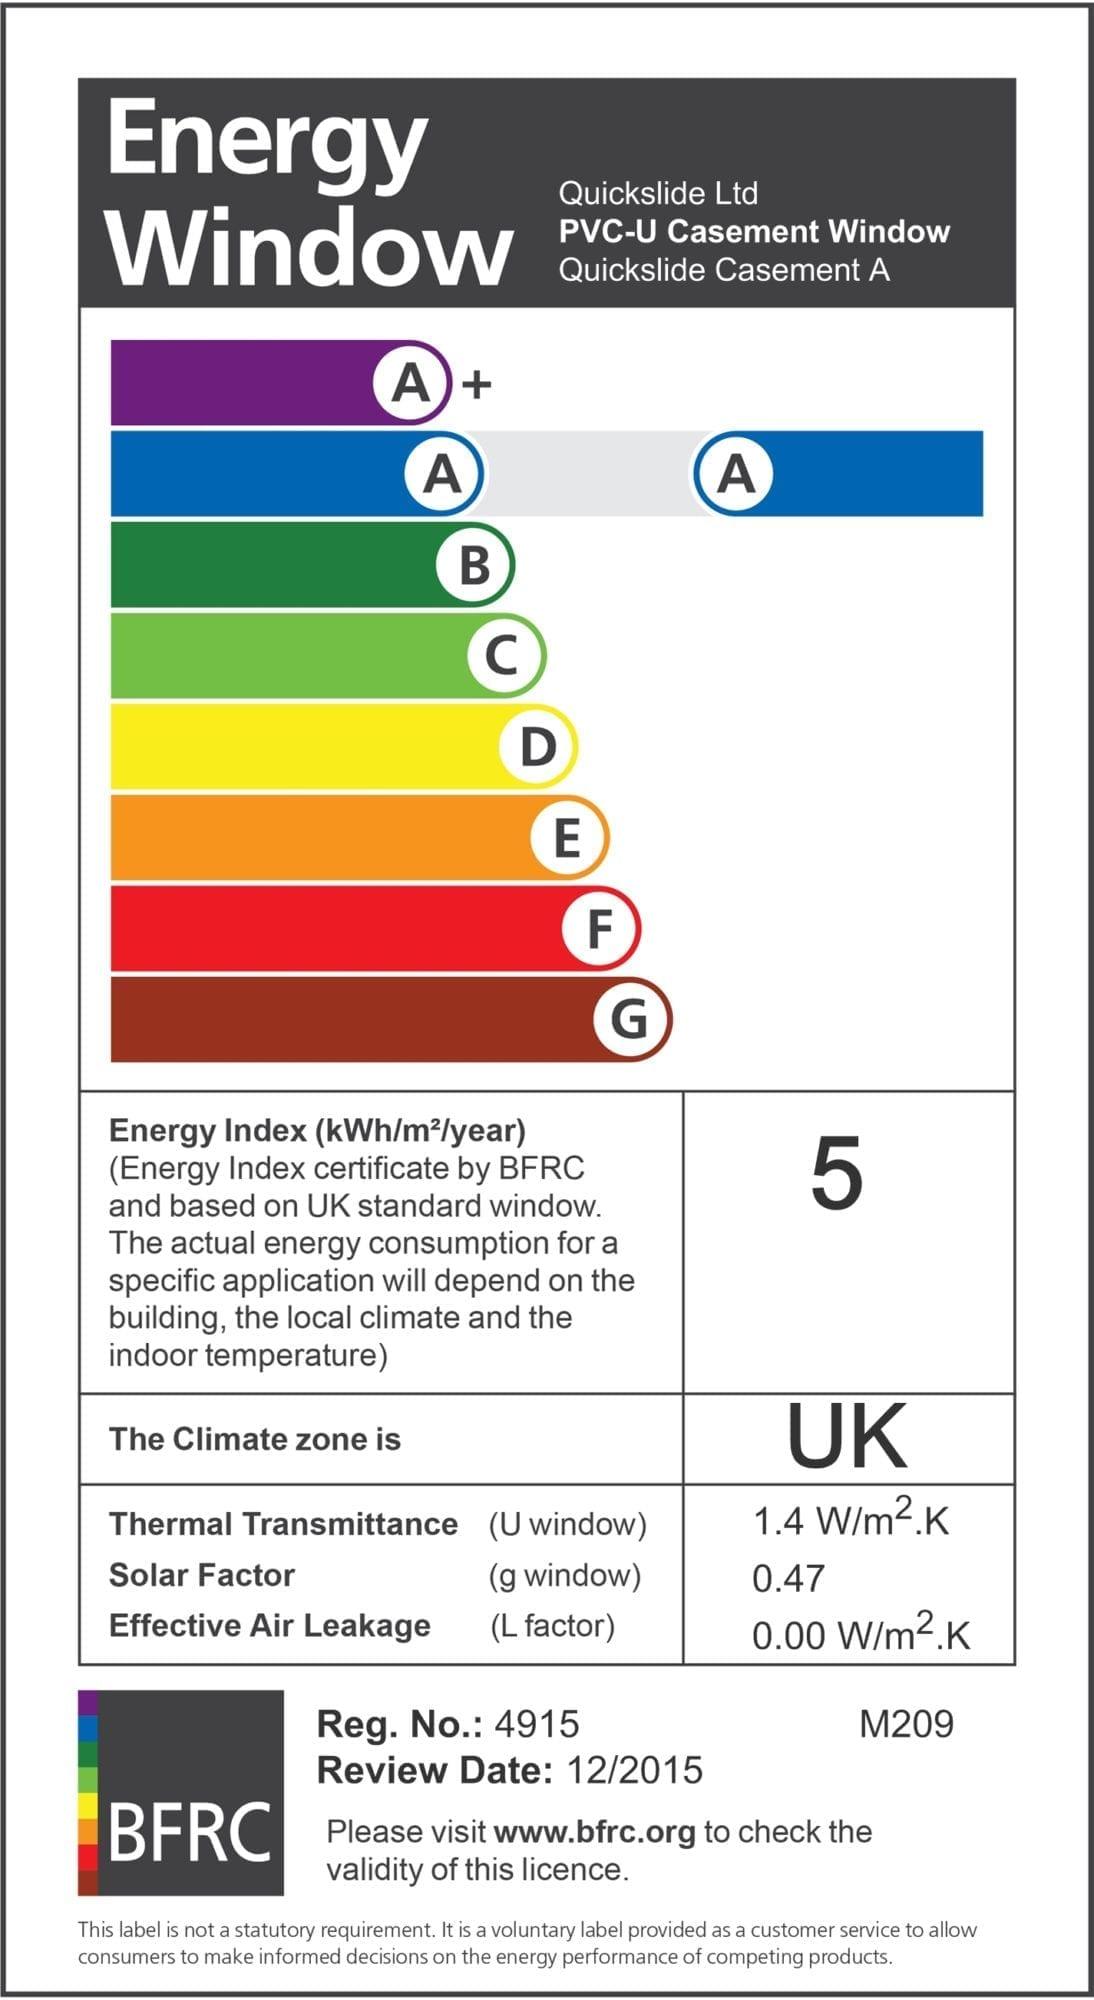 Pvcu casement windows energy rating quickslide for Energy windows